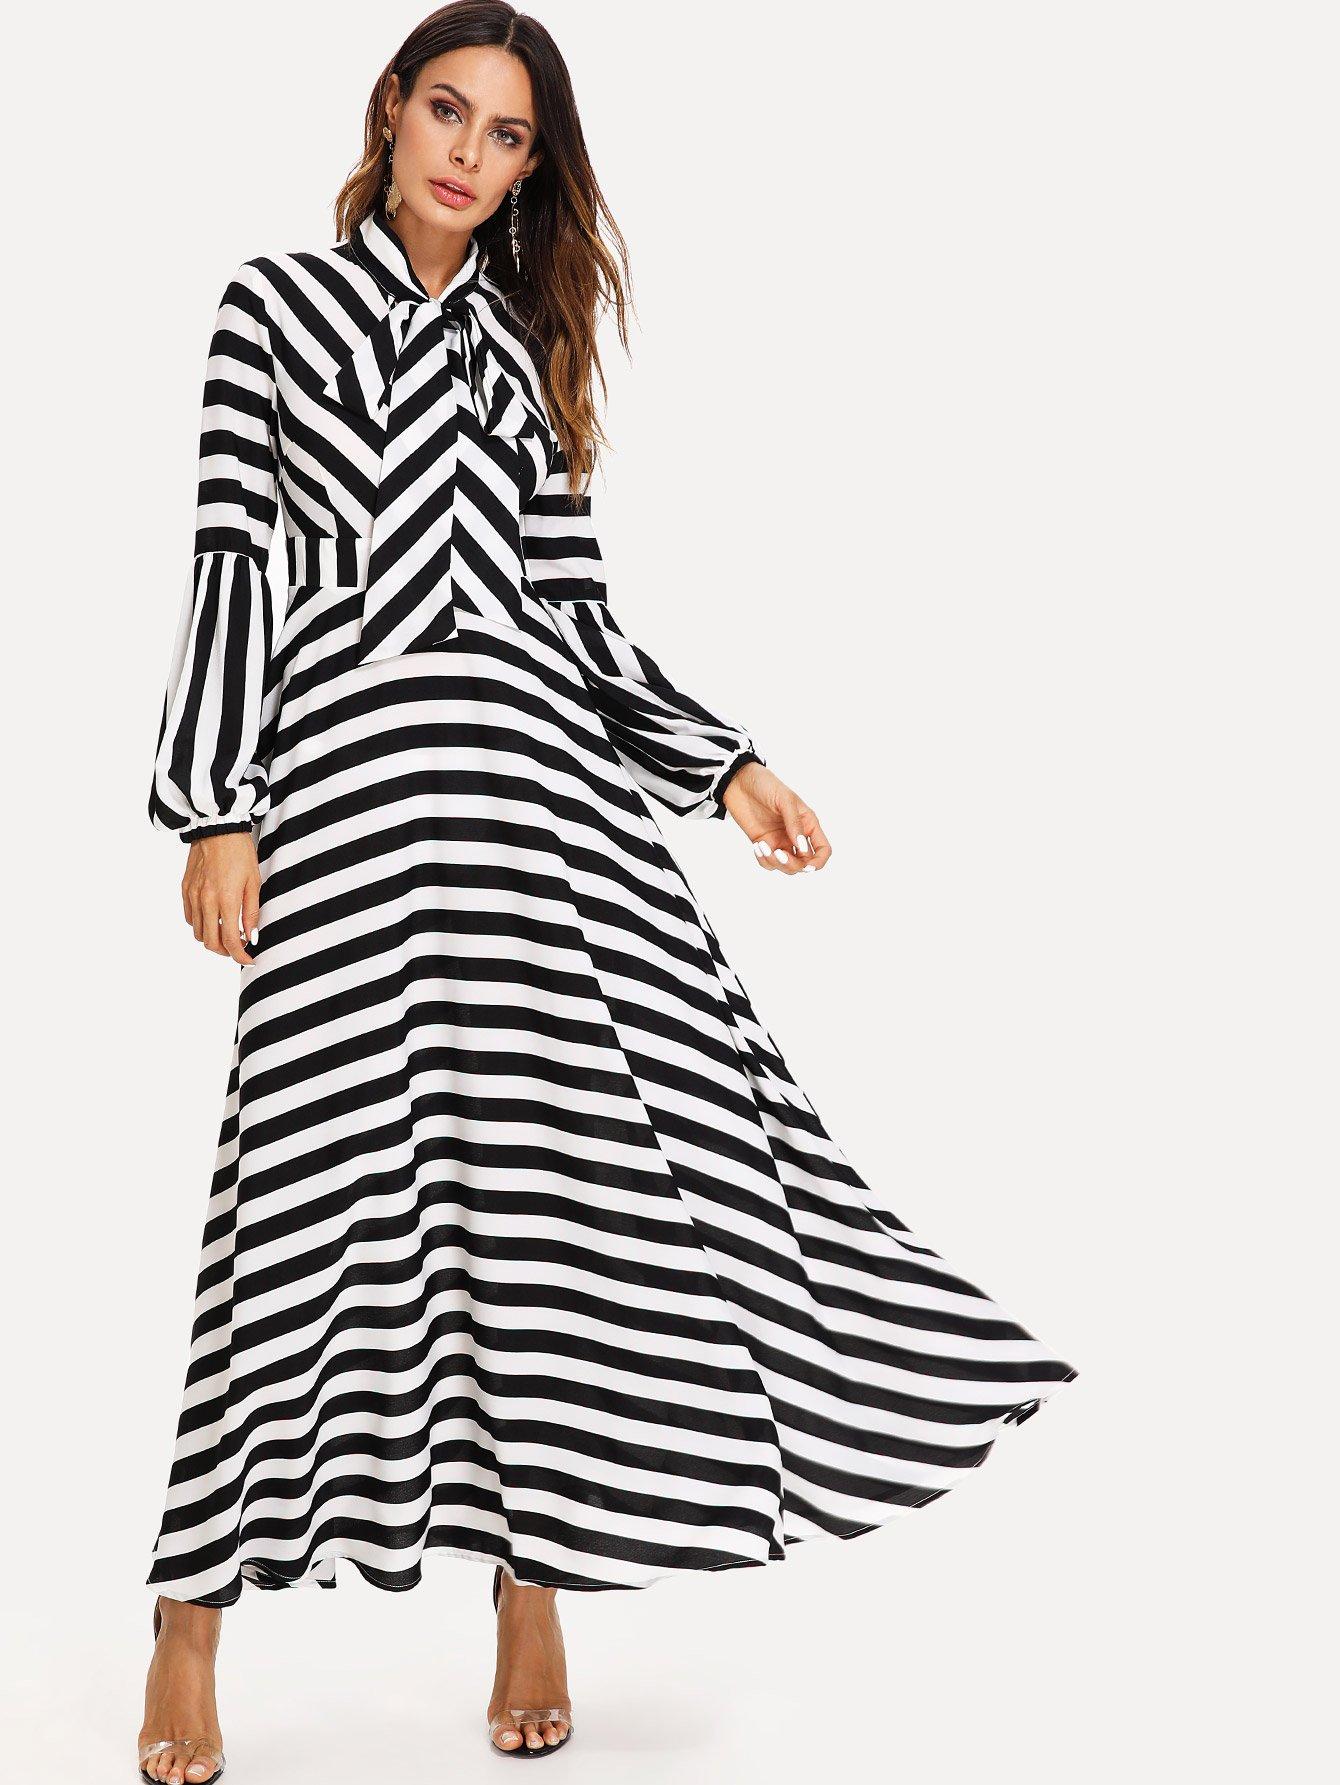 Bishop Sleeve Tied Neck Striped Flare Dress bishop sleeve tied neck striped flare dress